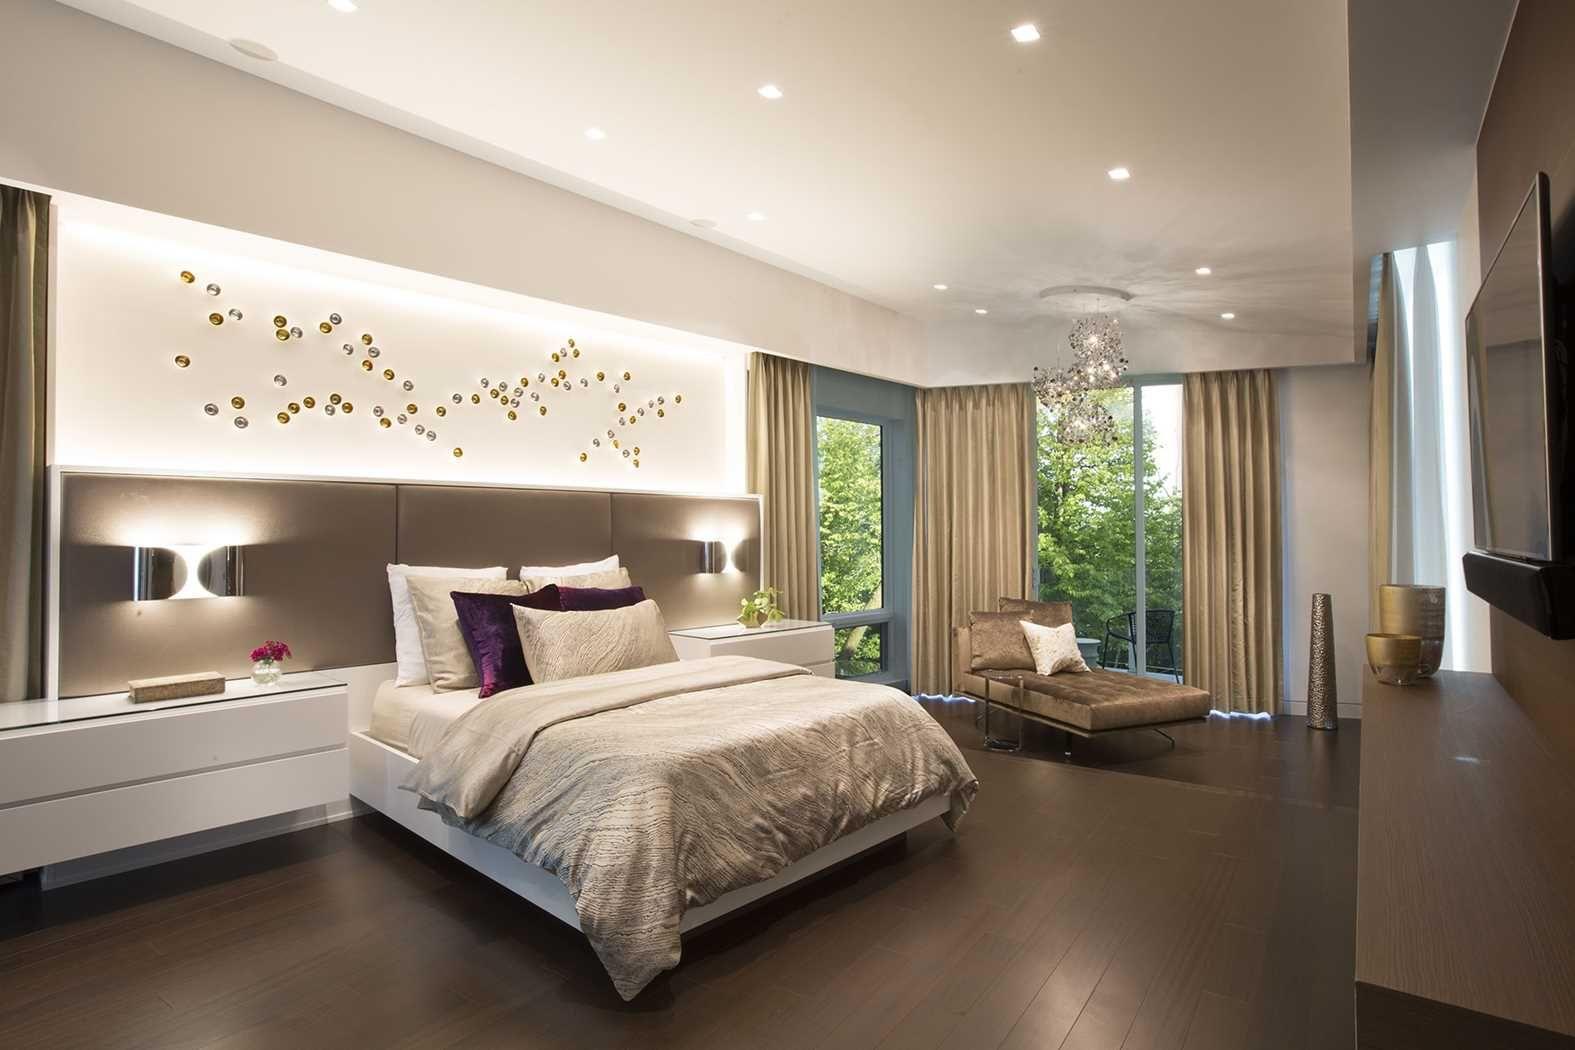 edge of modernism dkor interiors residential interior design